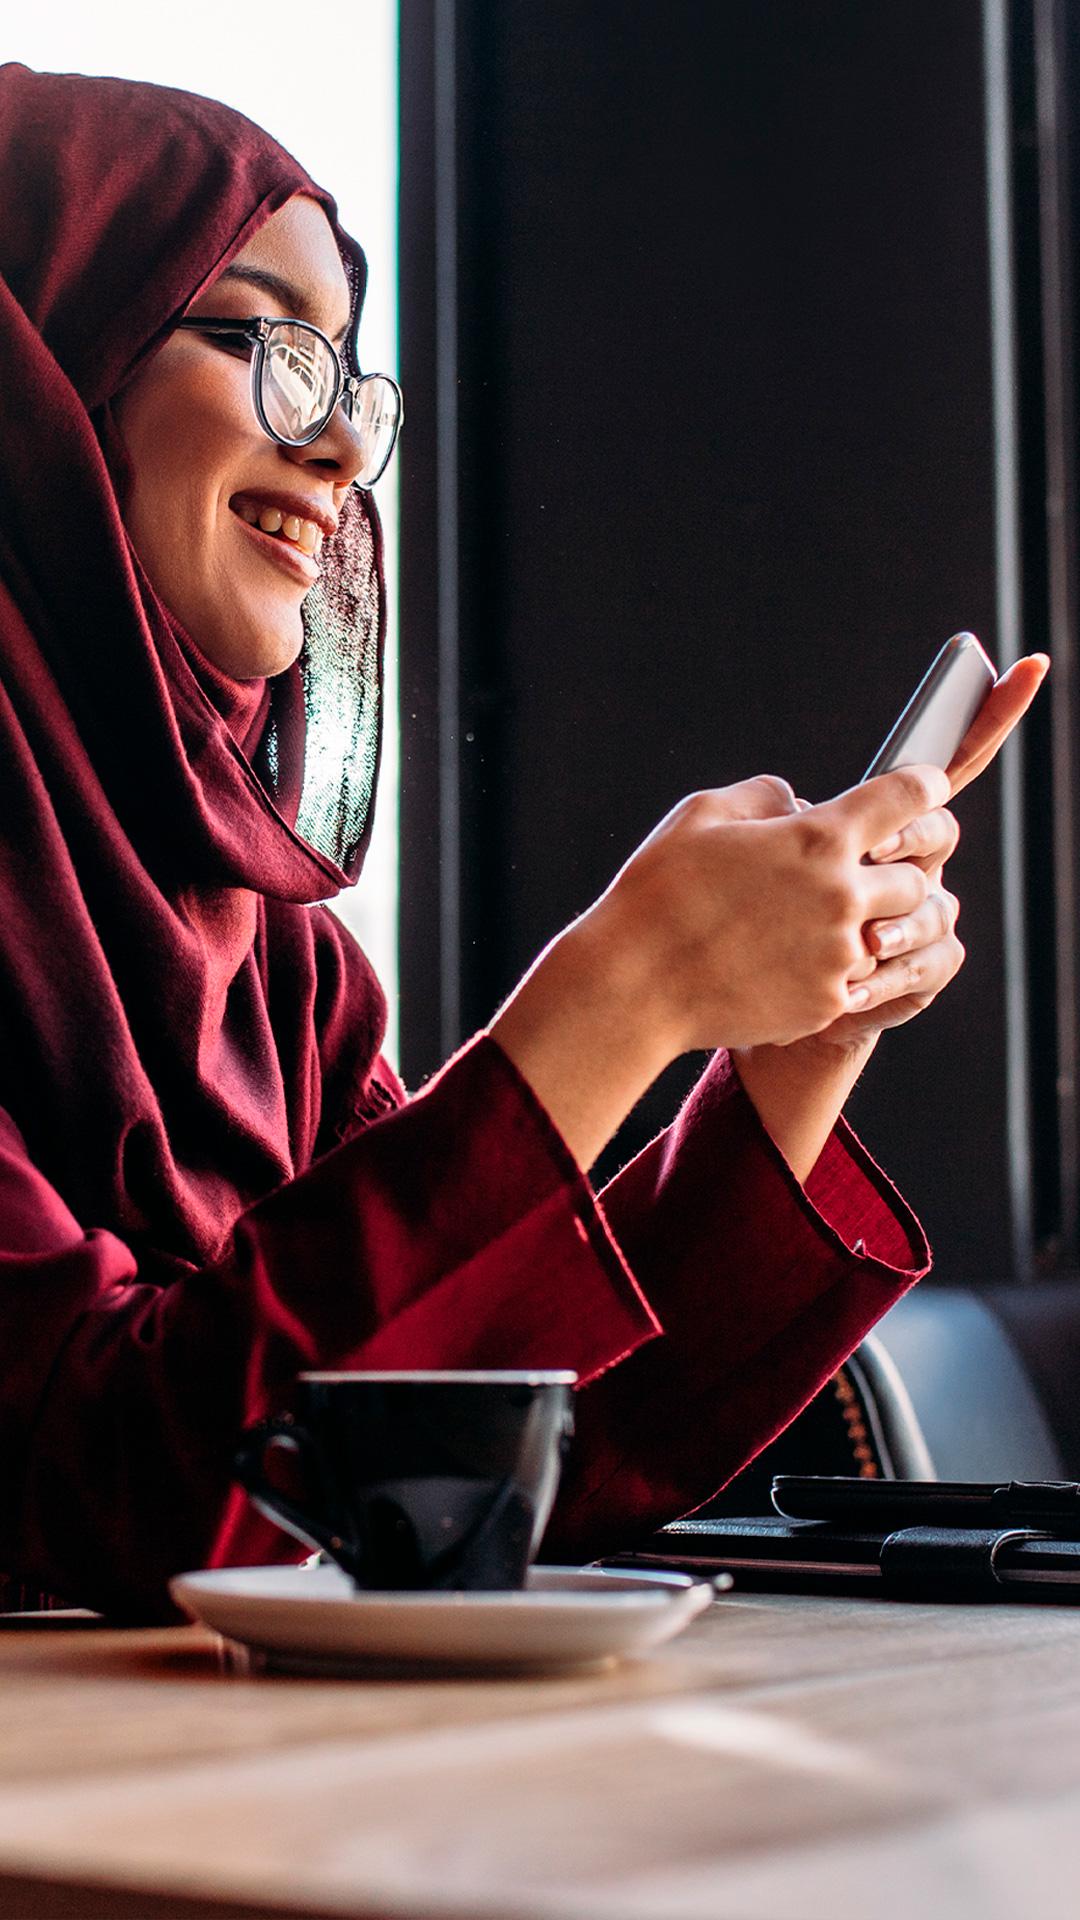 women smiling using smart phone